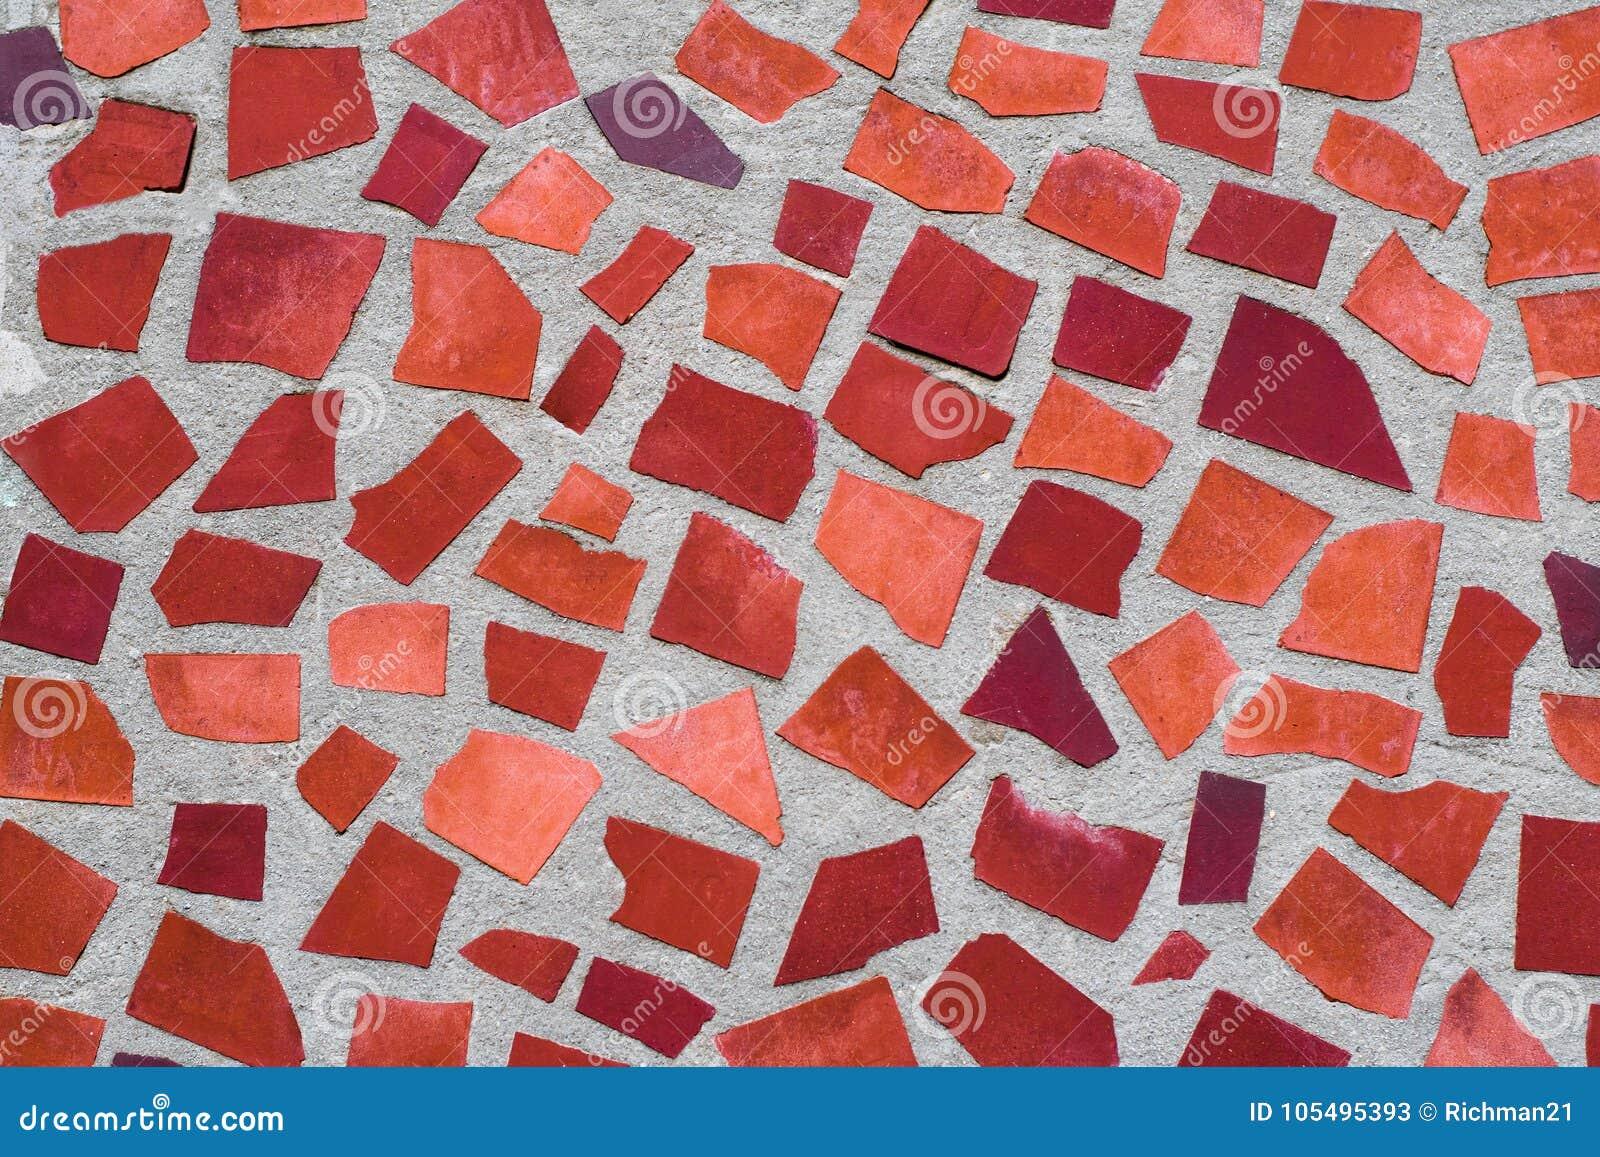 La Textura Del Ornamento Decorativo De La Pared Del Mosaico